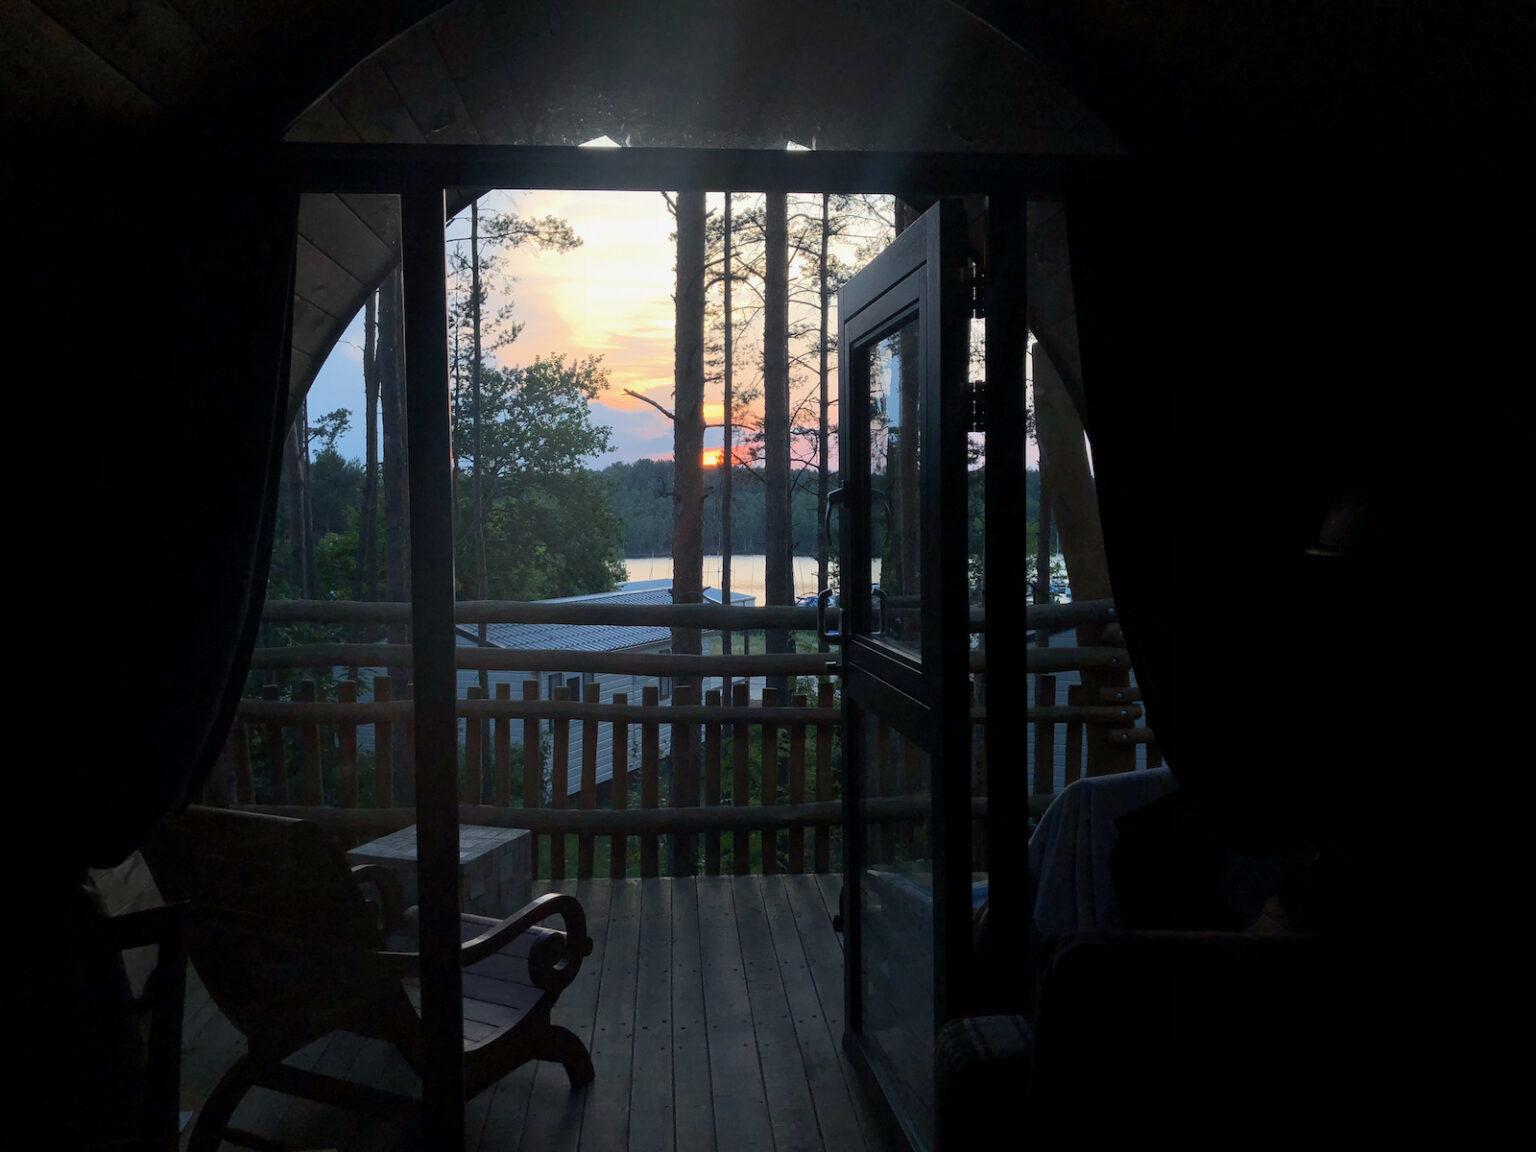 Sonnenuntergang in den Baumwipfeln am Senftenberger See